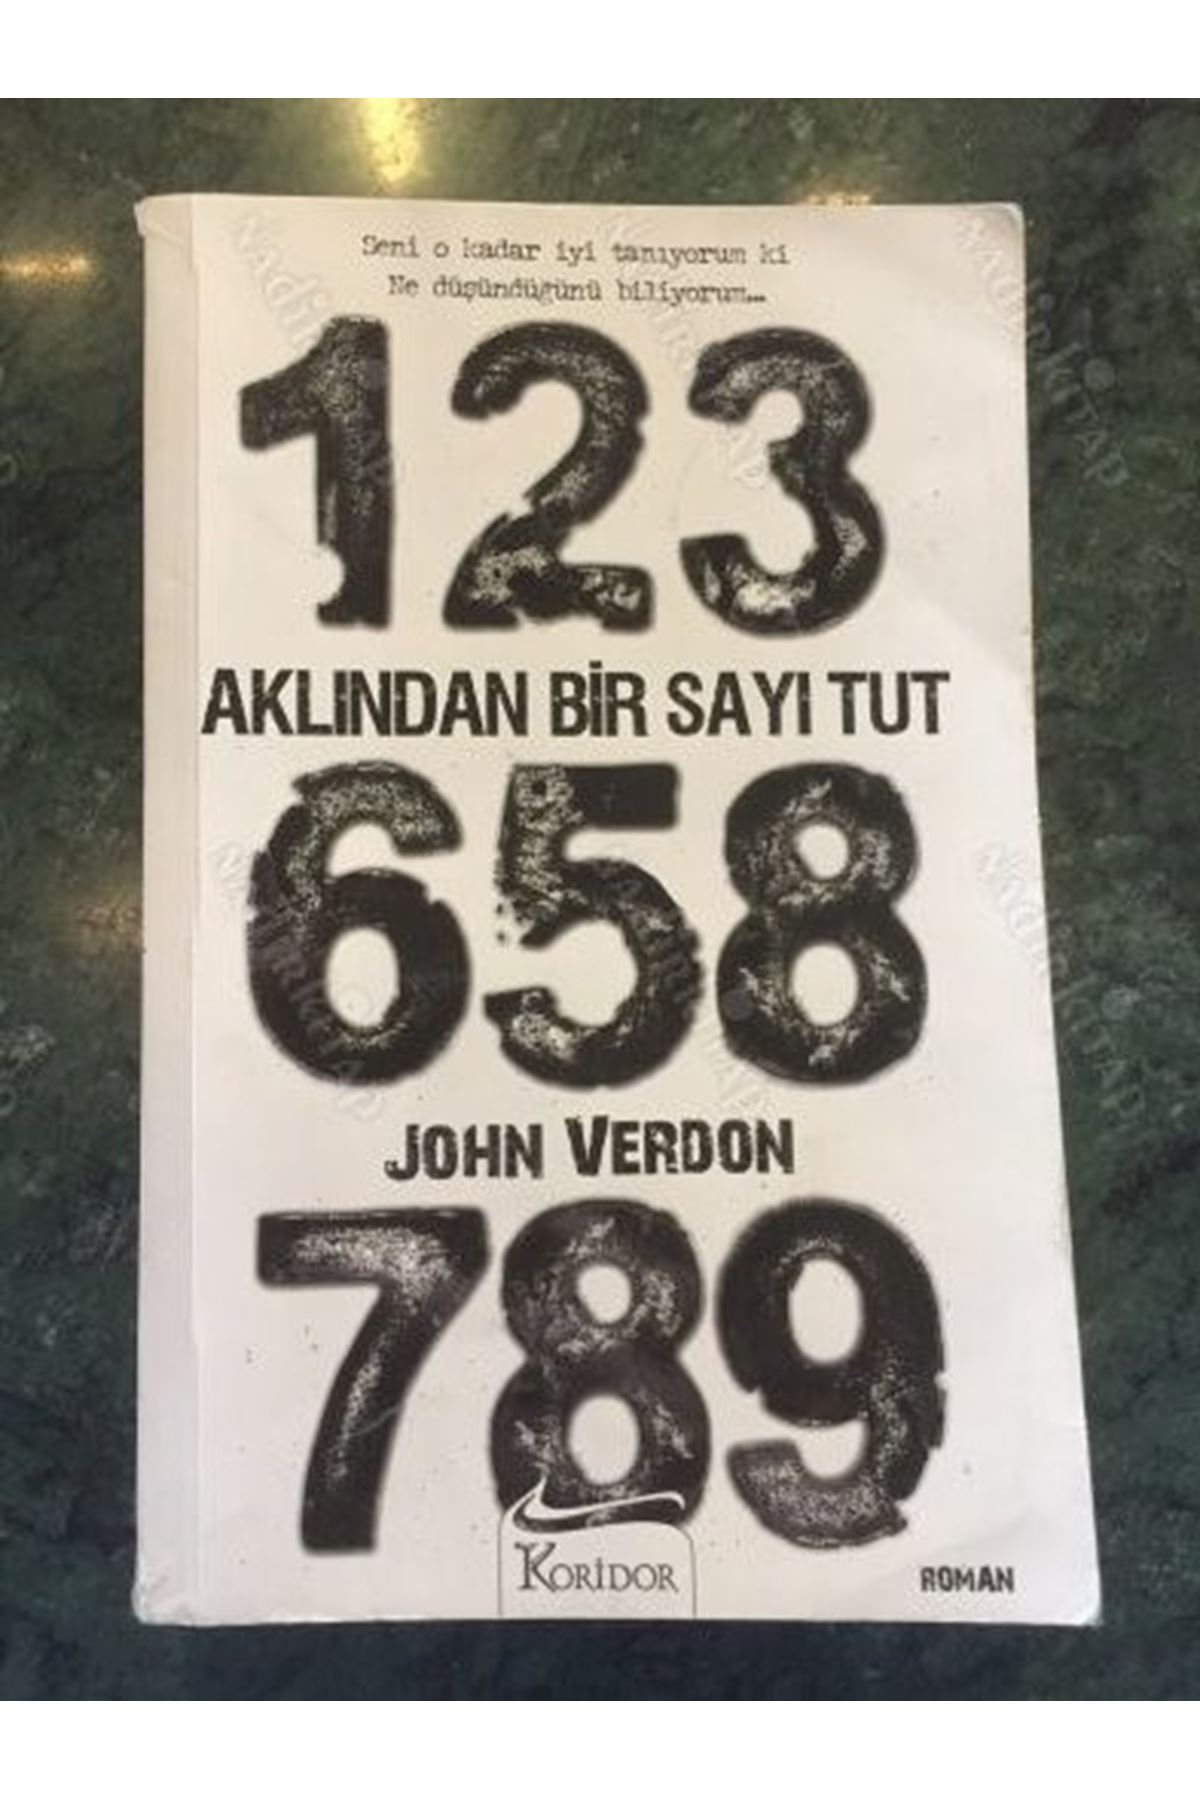 JOHN VERDON - AKLINDAN BİR SAYI TUT